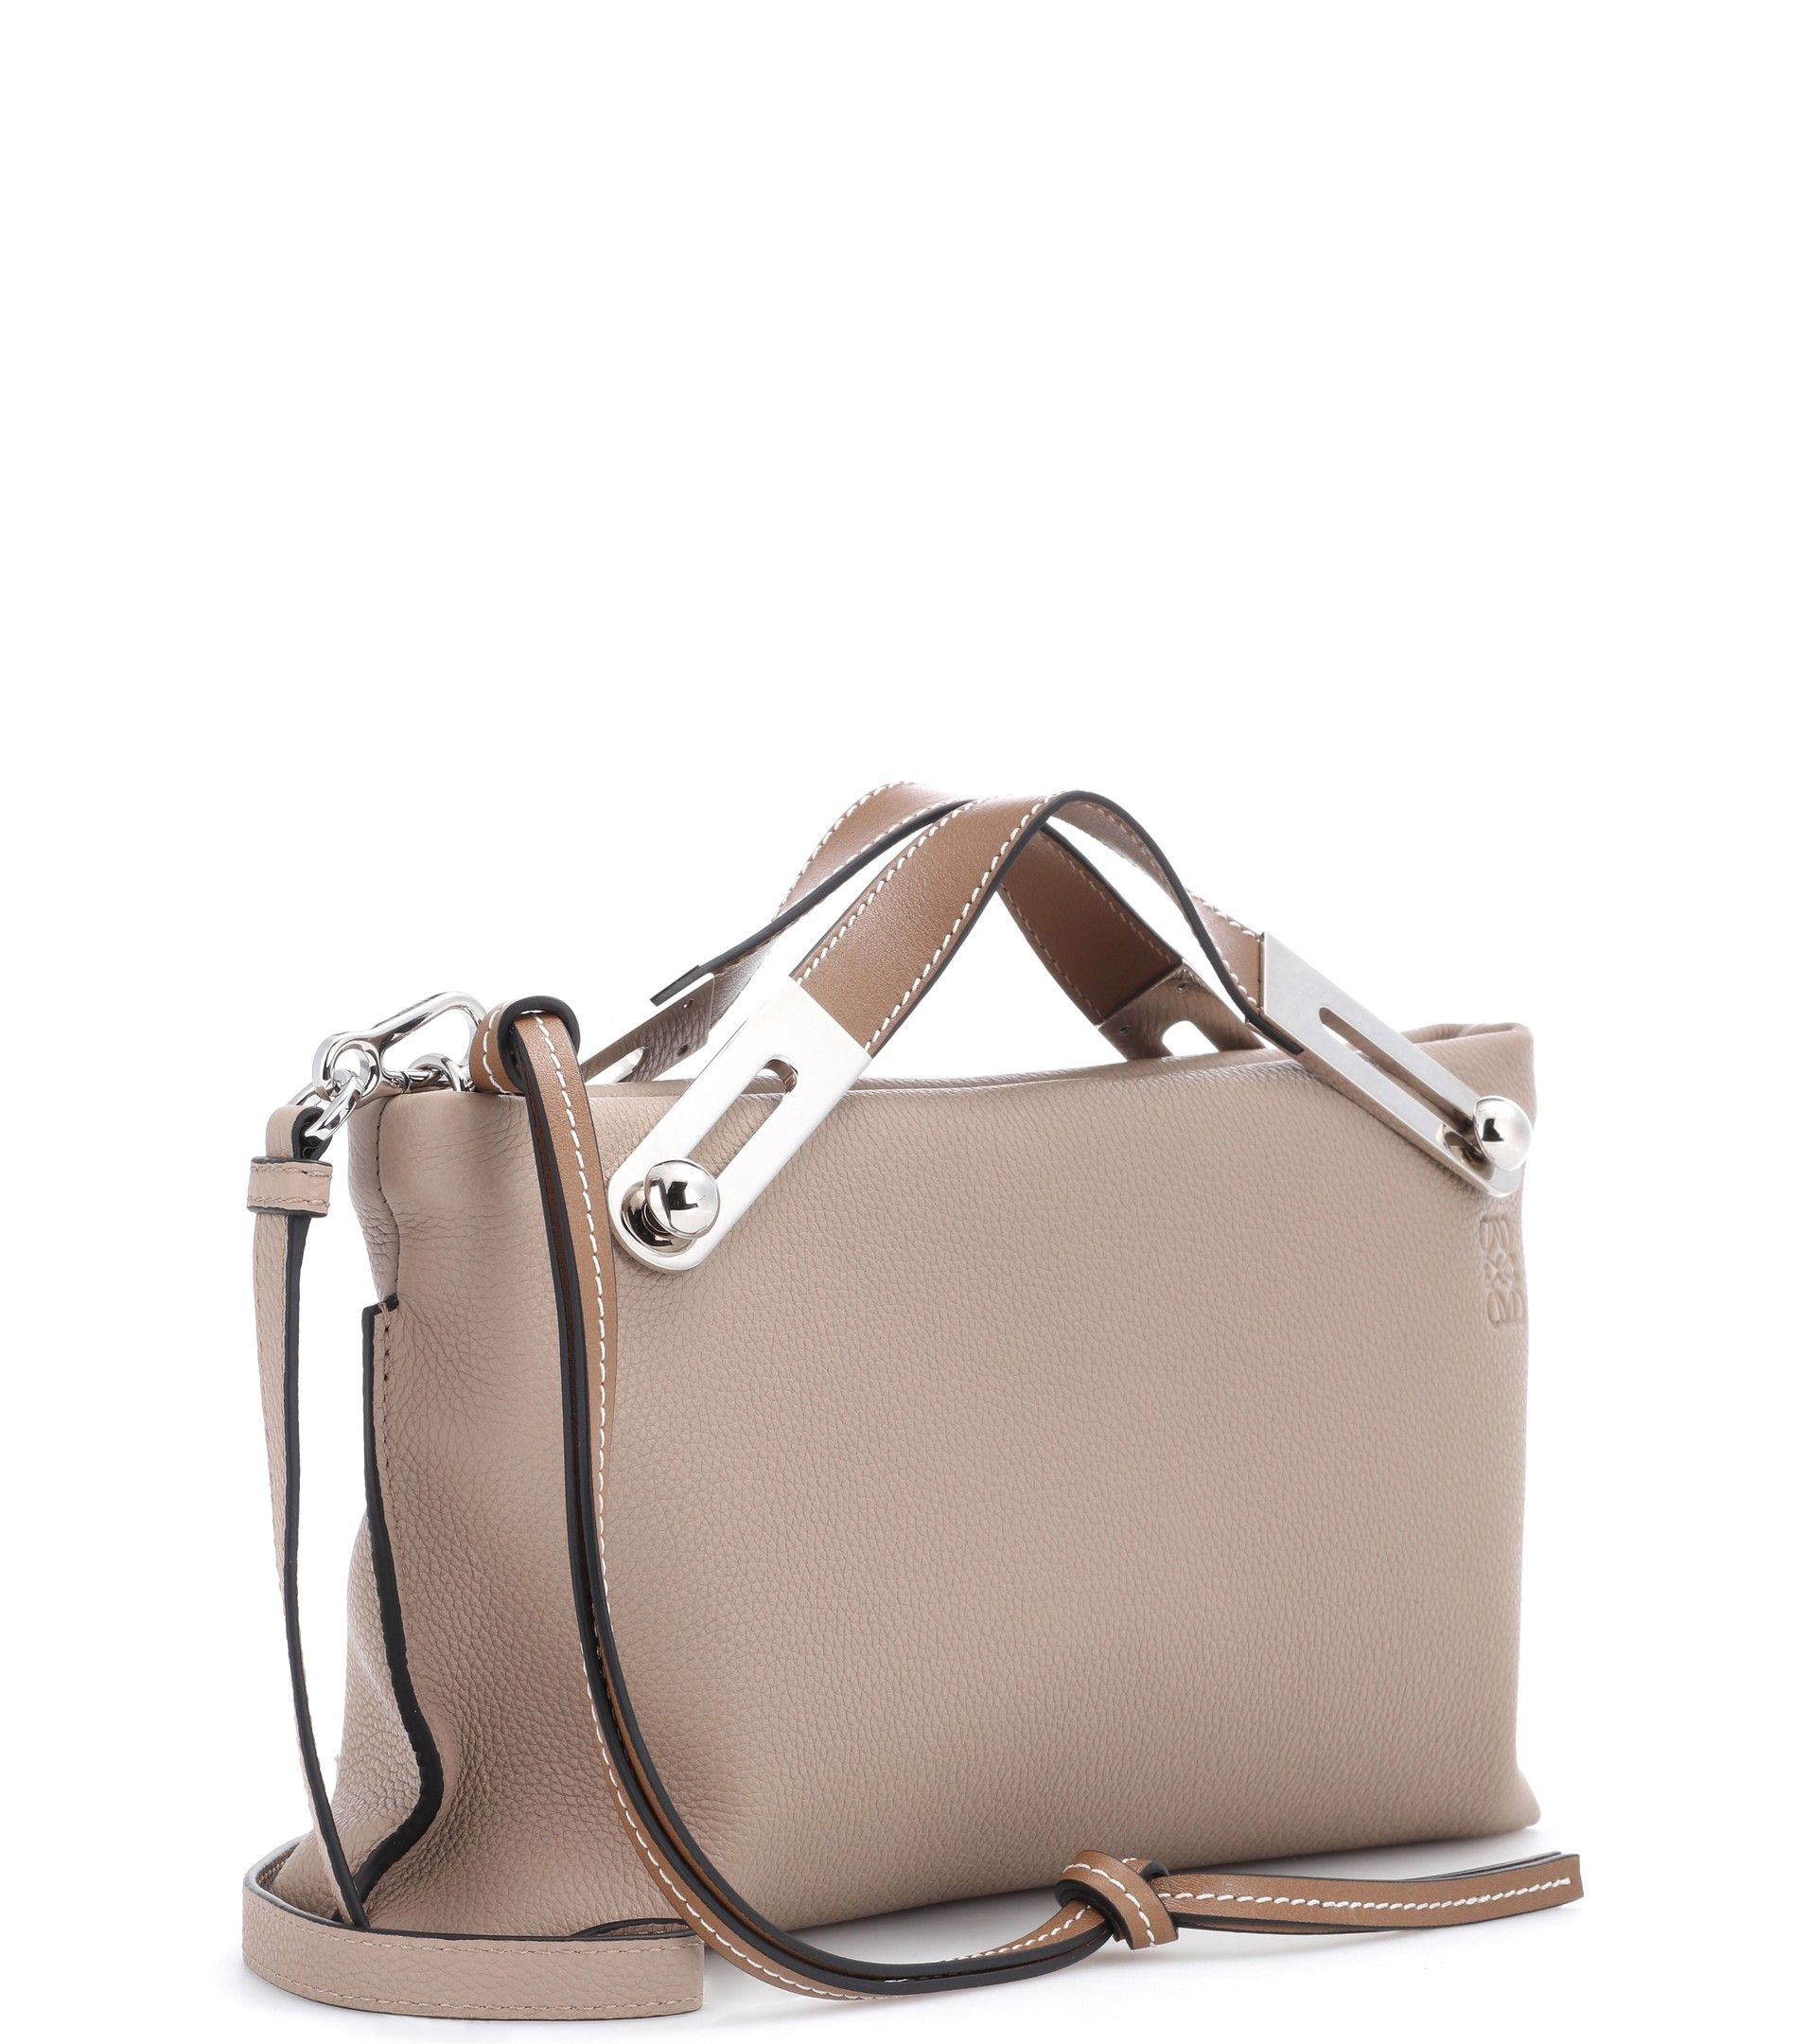 Missy Leather Clutch Loewe vb5EfbnS